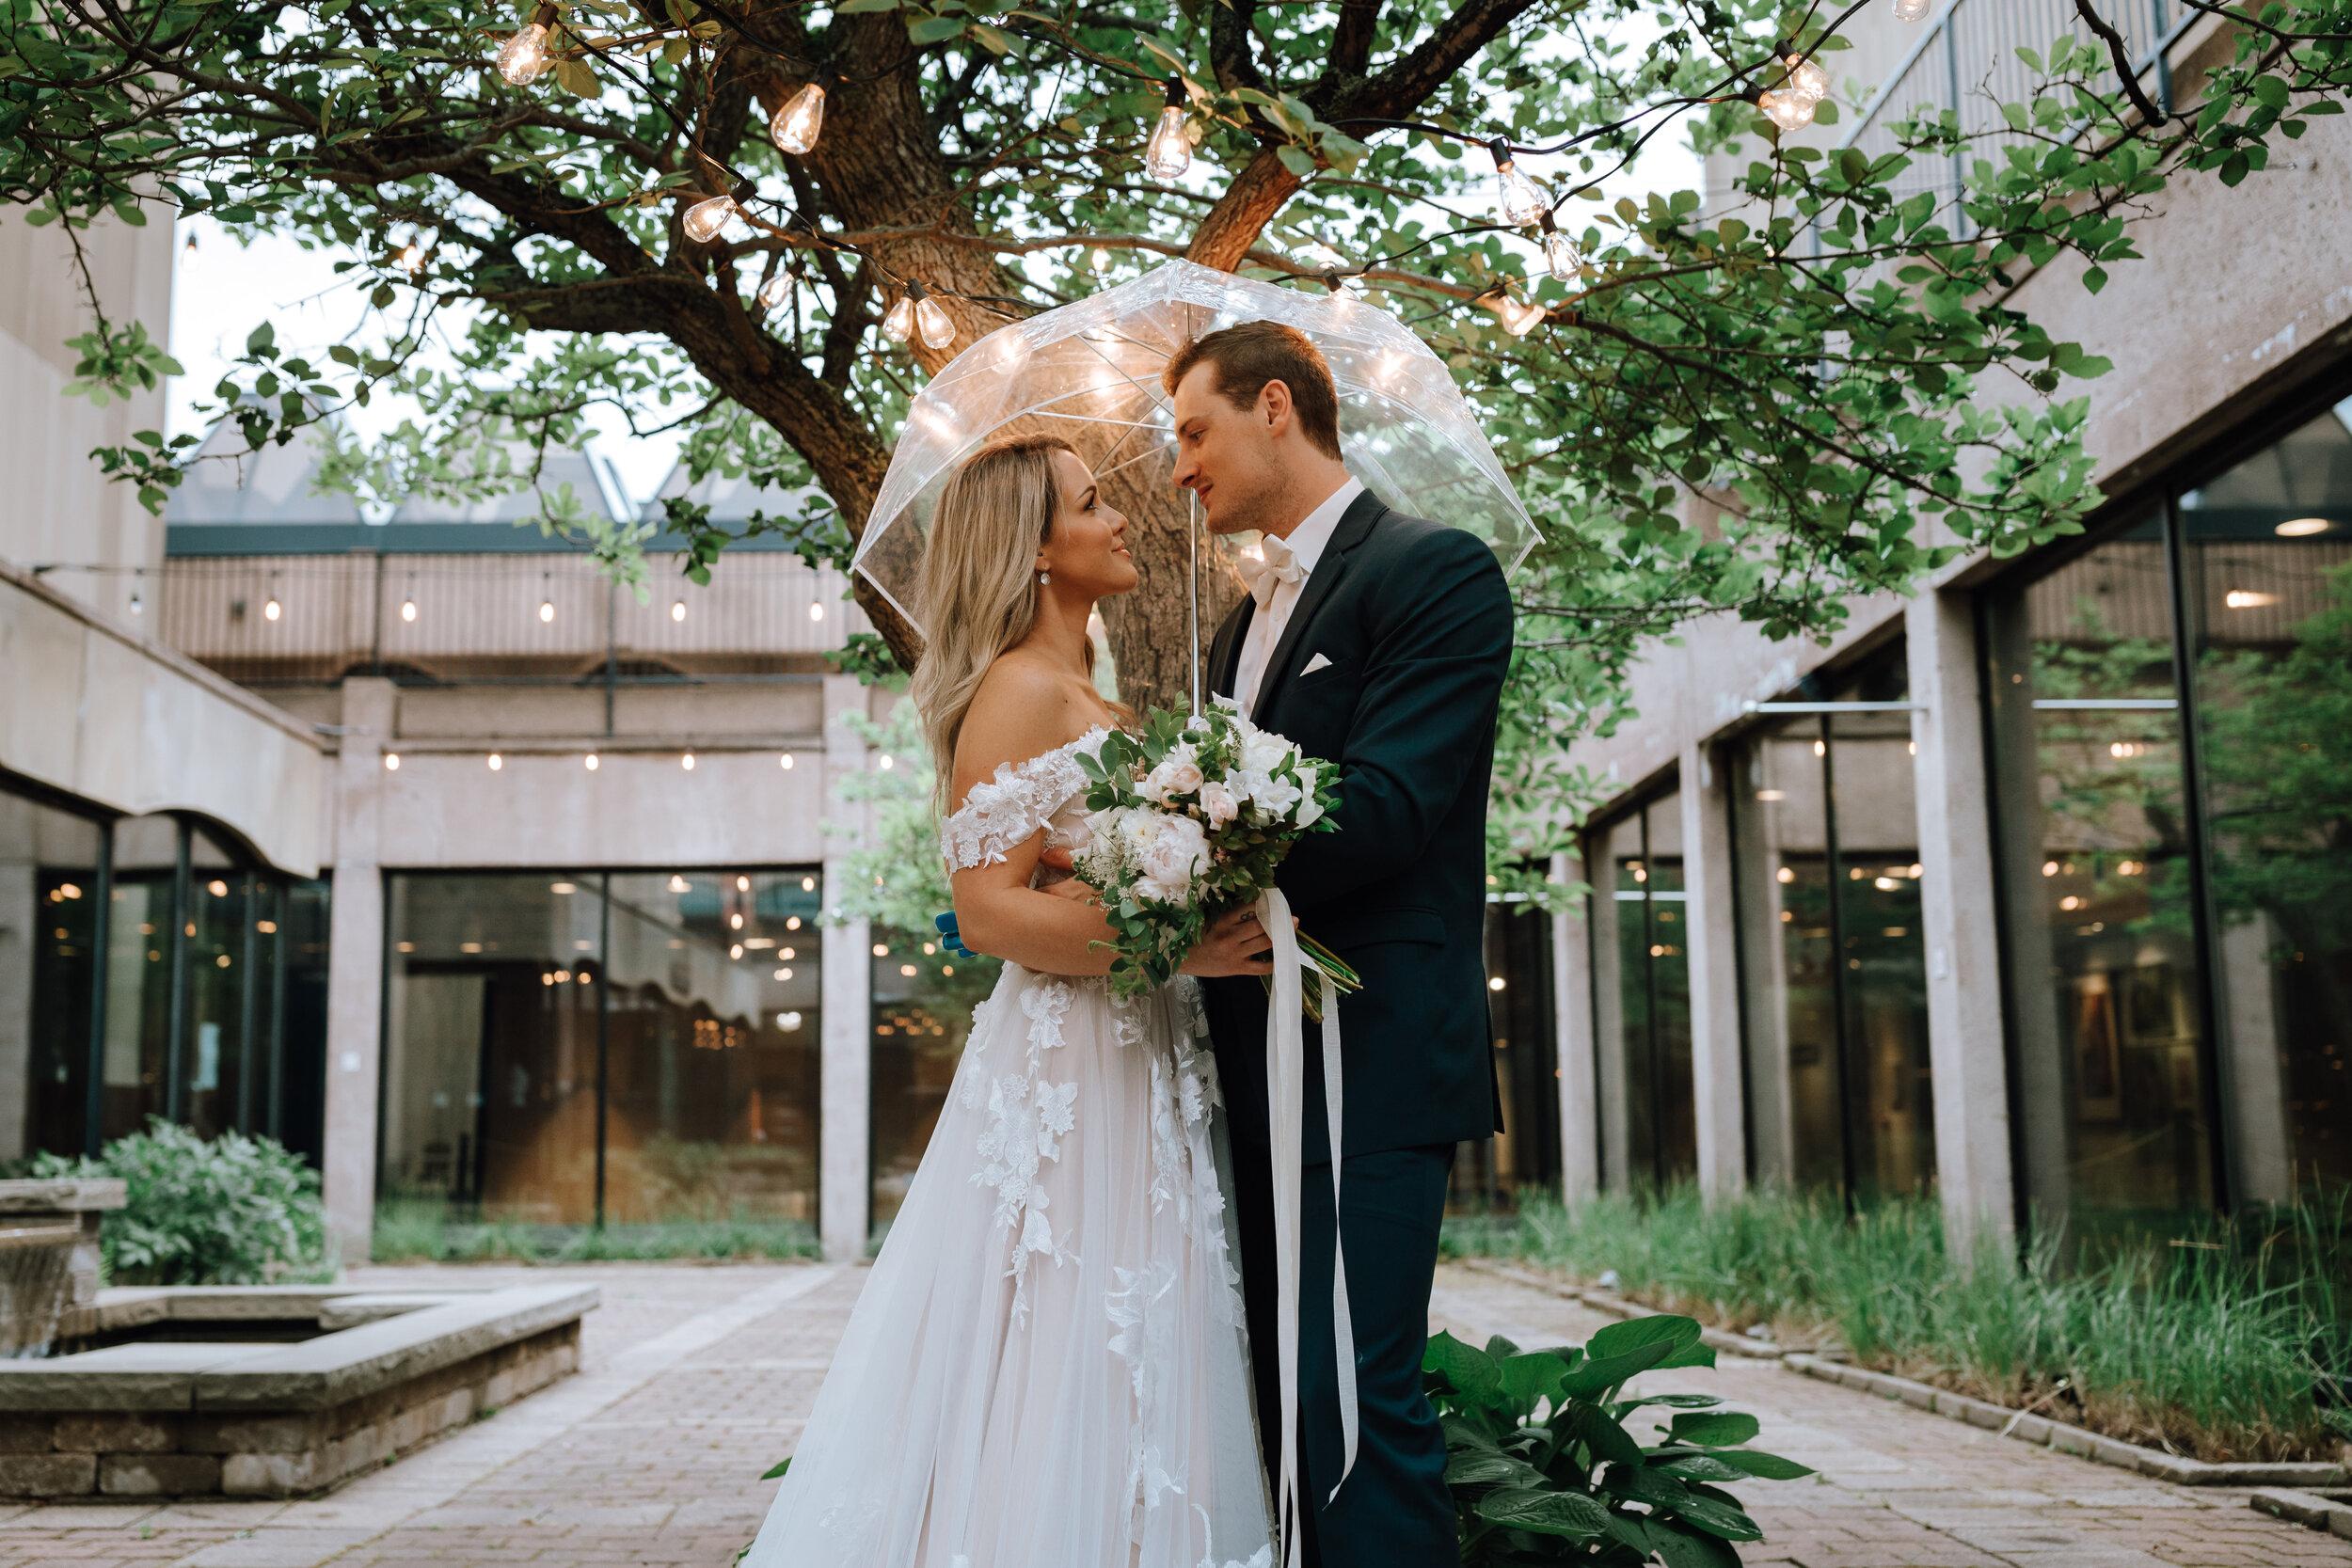 Ad9g75sf Pwnsm,Where To Buy Anna Campbell Wedding Dresses